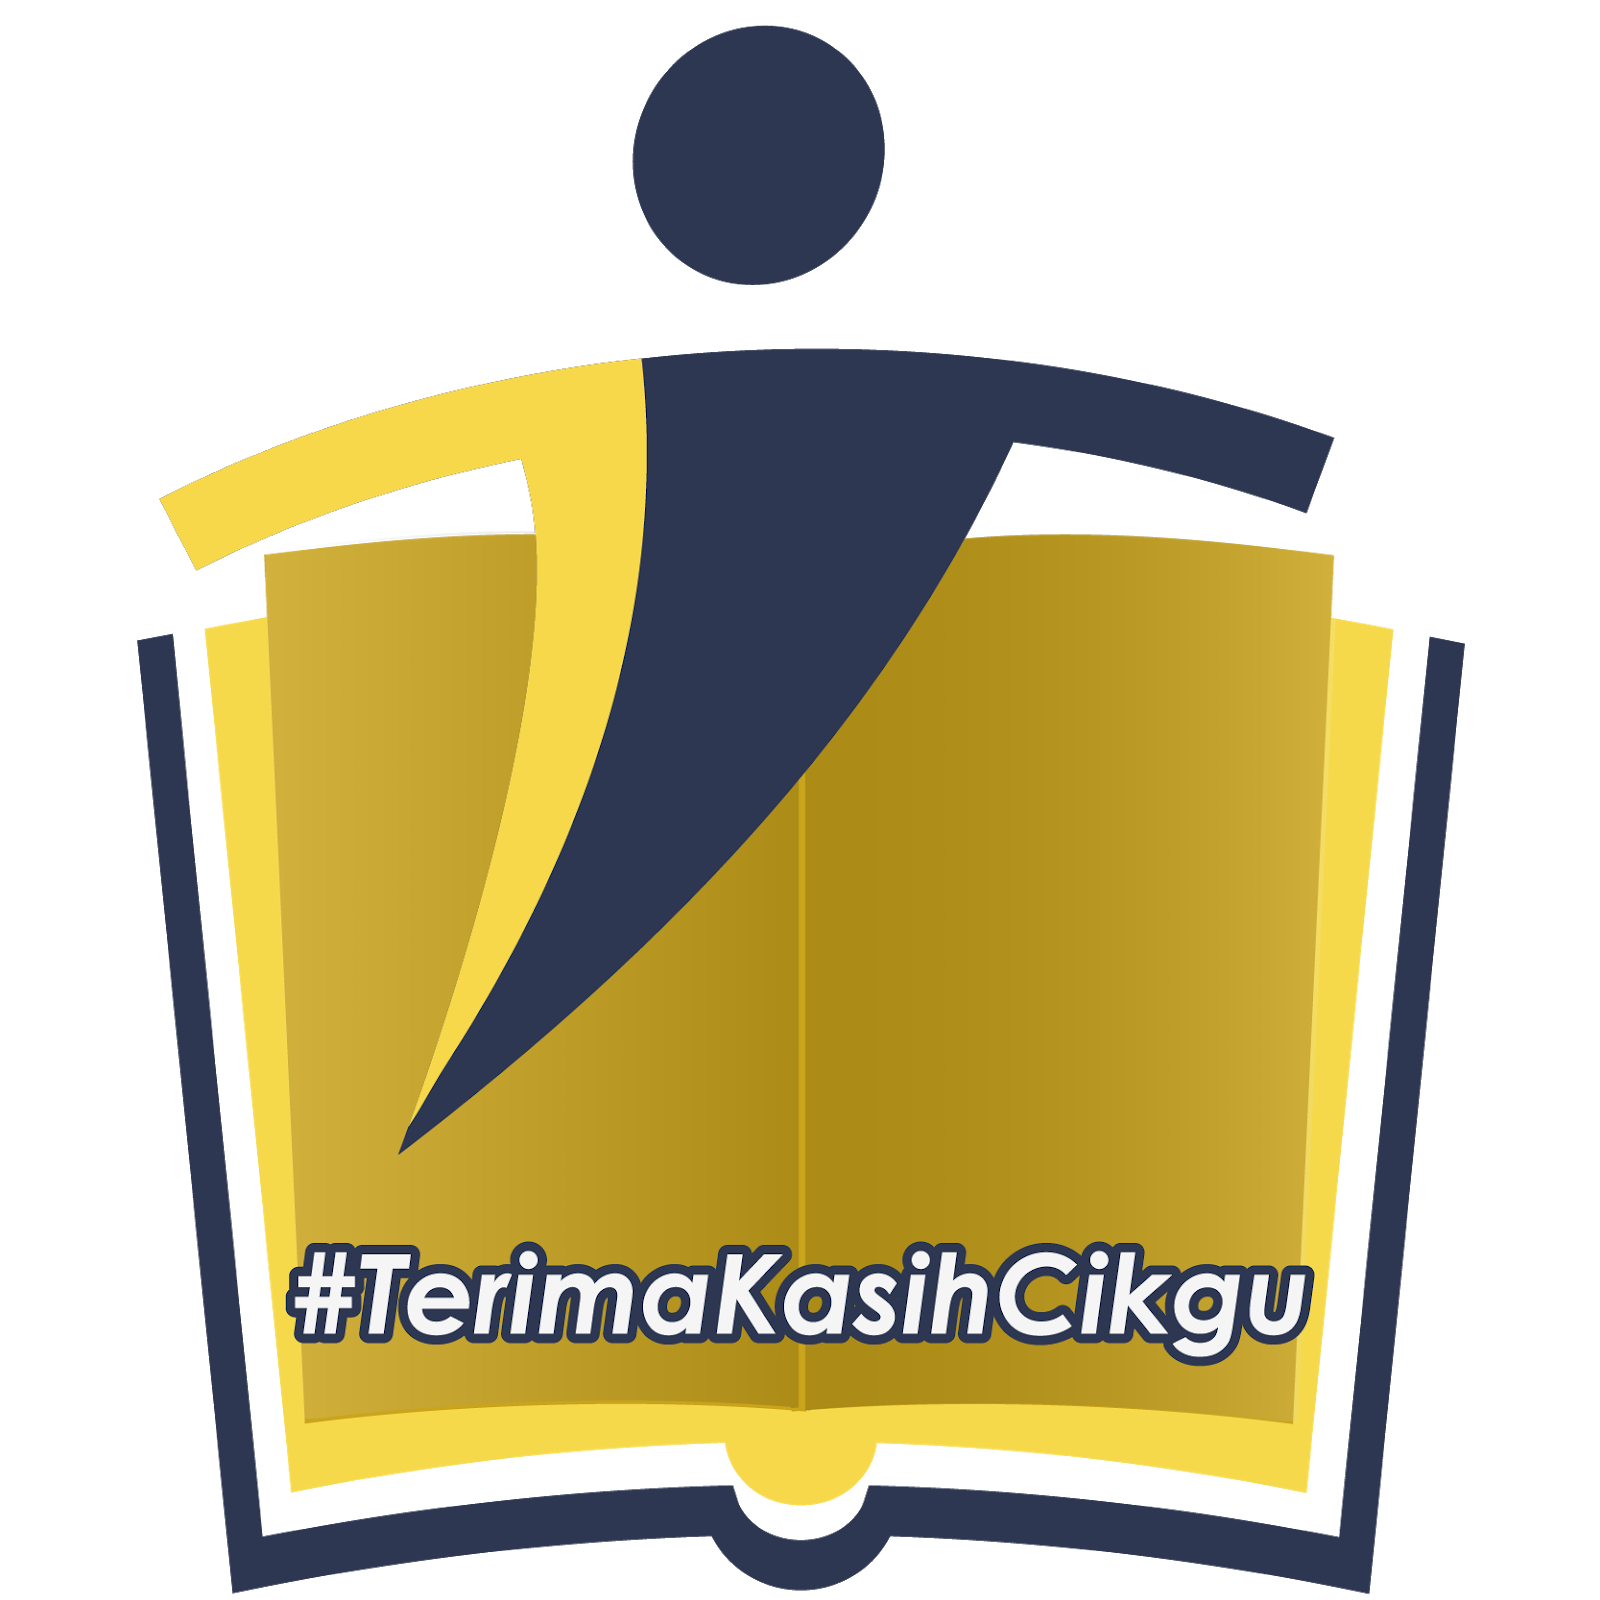 Tafsiran Logo Dan Tema Hari Guru 2019 Media Kabar Malay